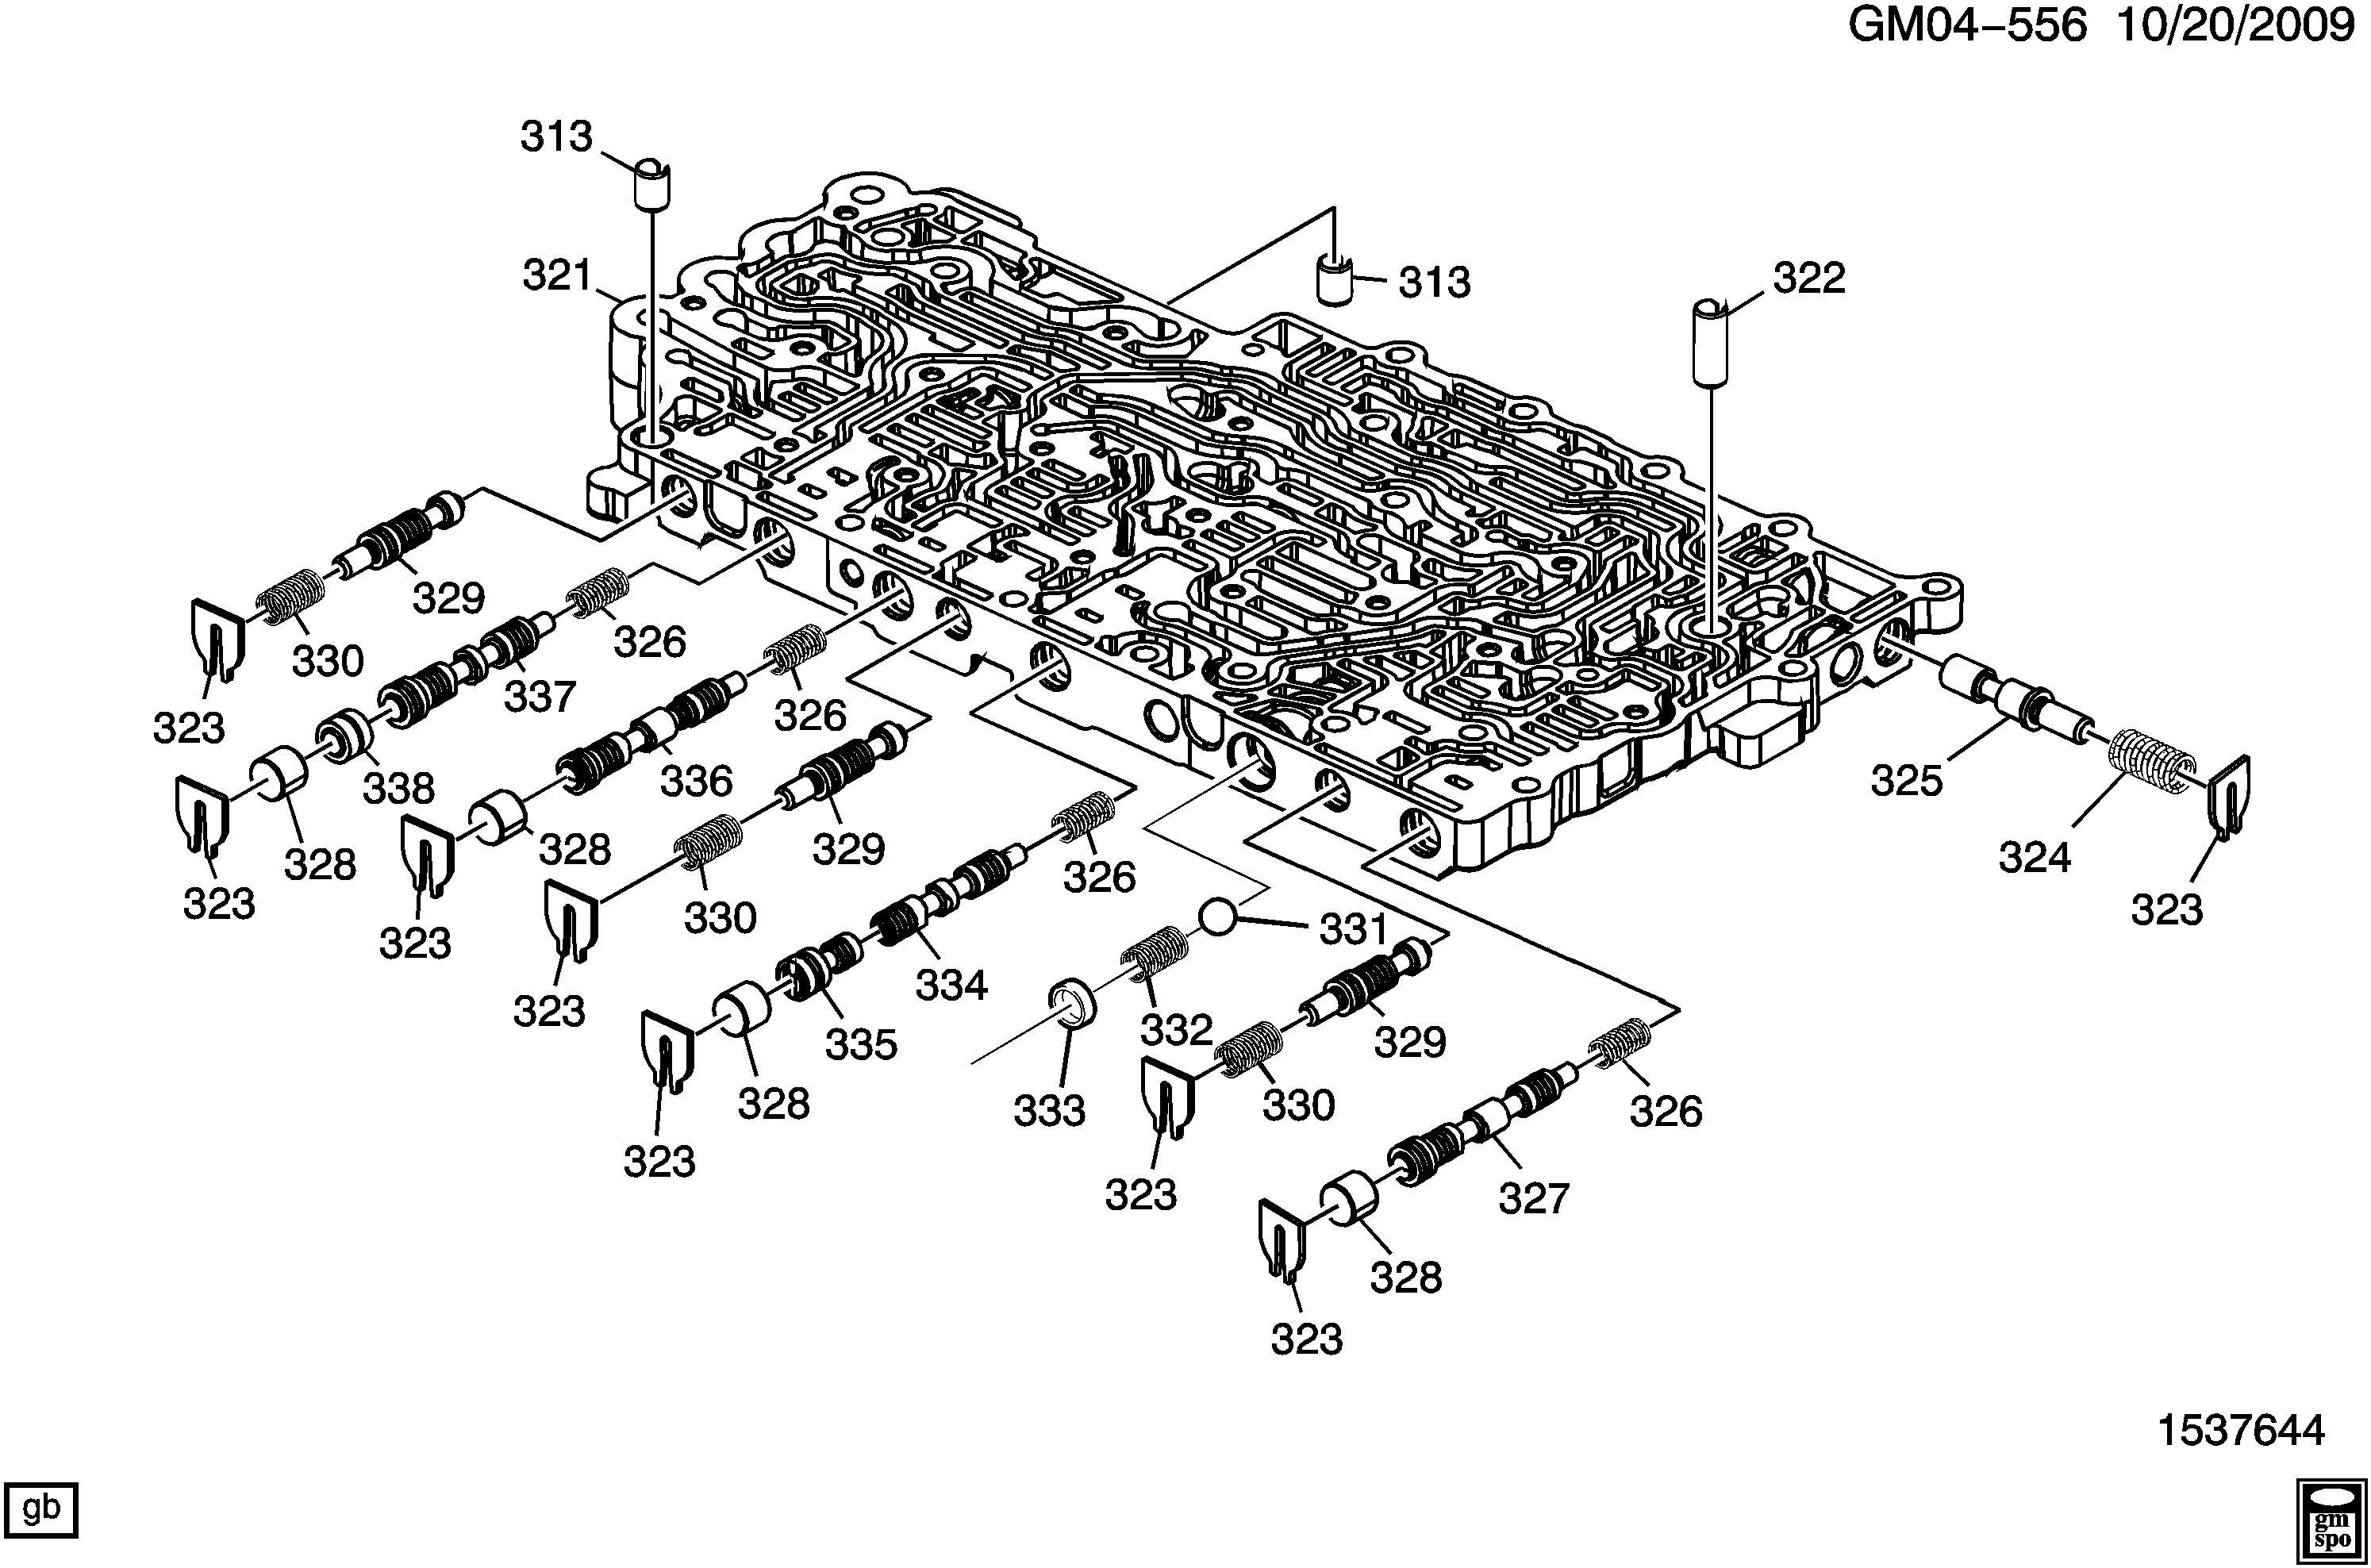 Cadillac STS - DX29 AUTOMATIC TRANSMISSION (MYC) (6L80